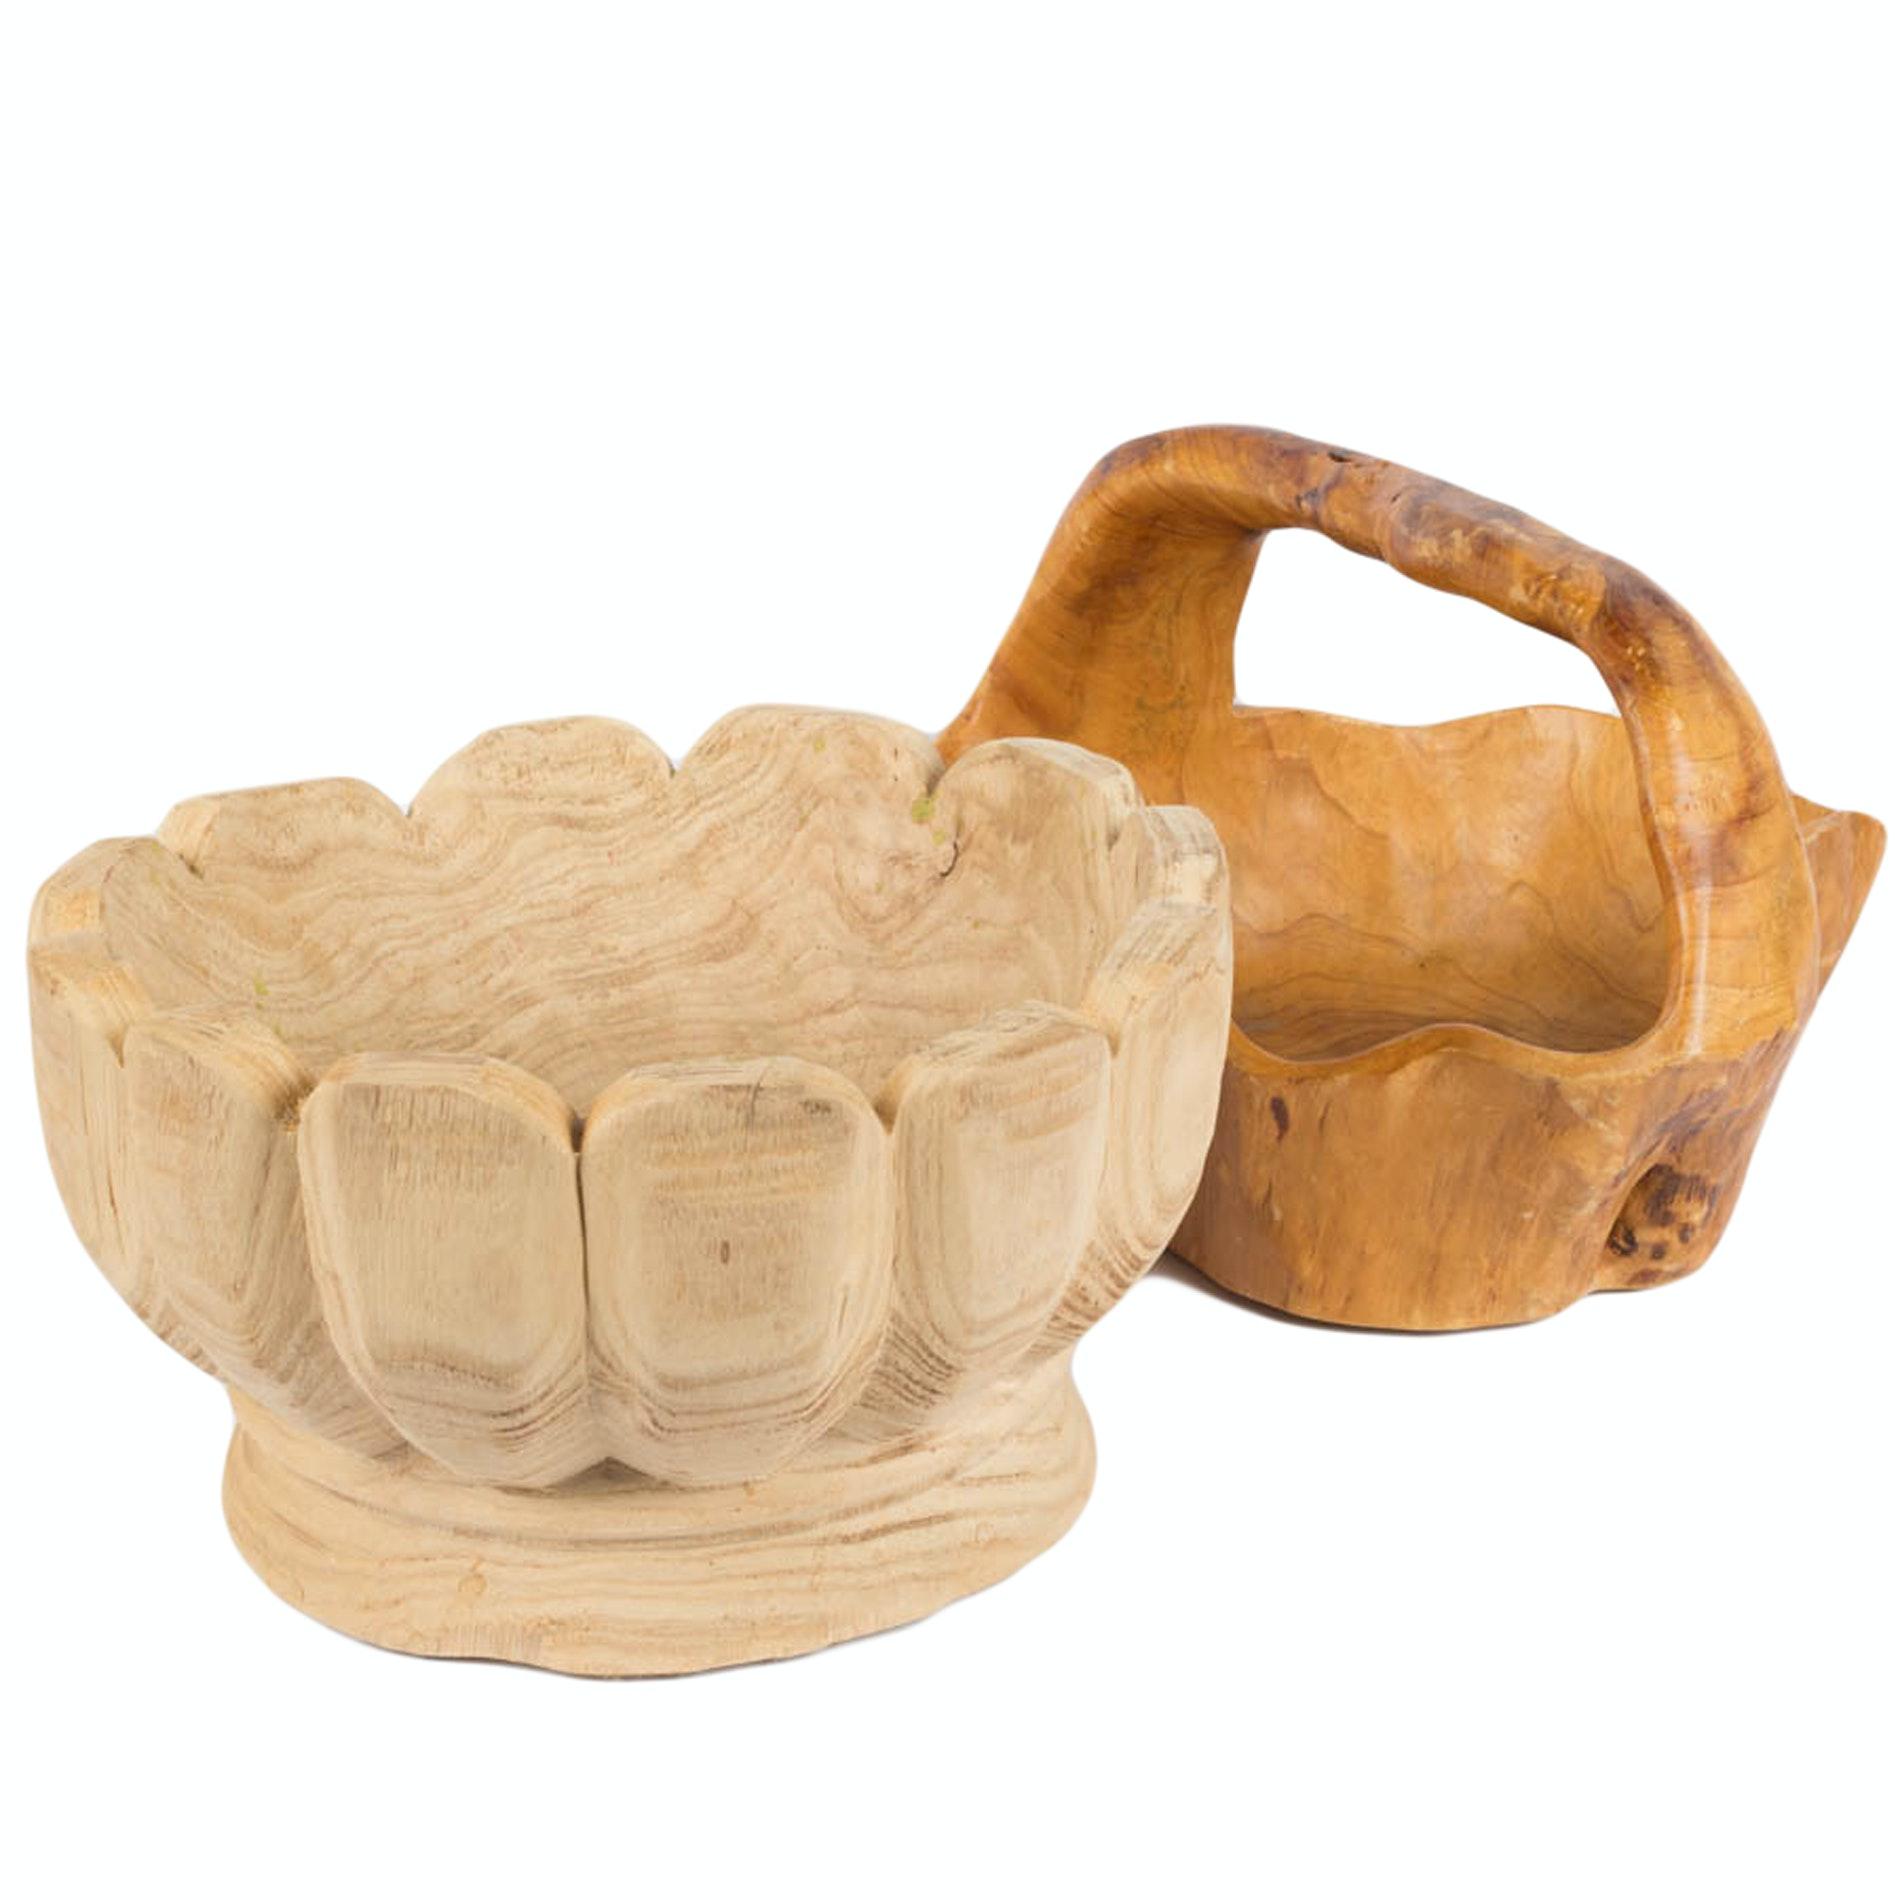 Handcrafted Wooden Centerpiece Bowls